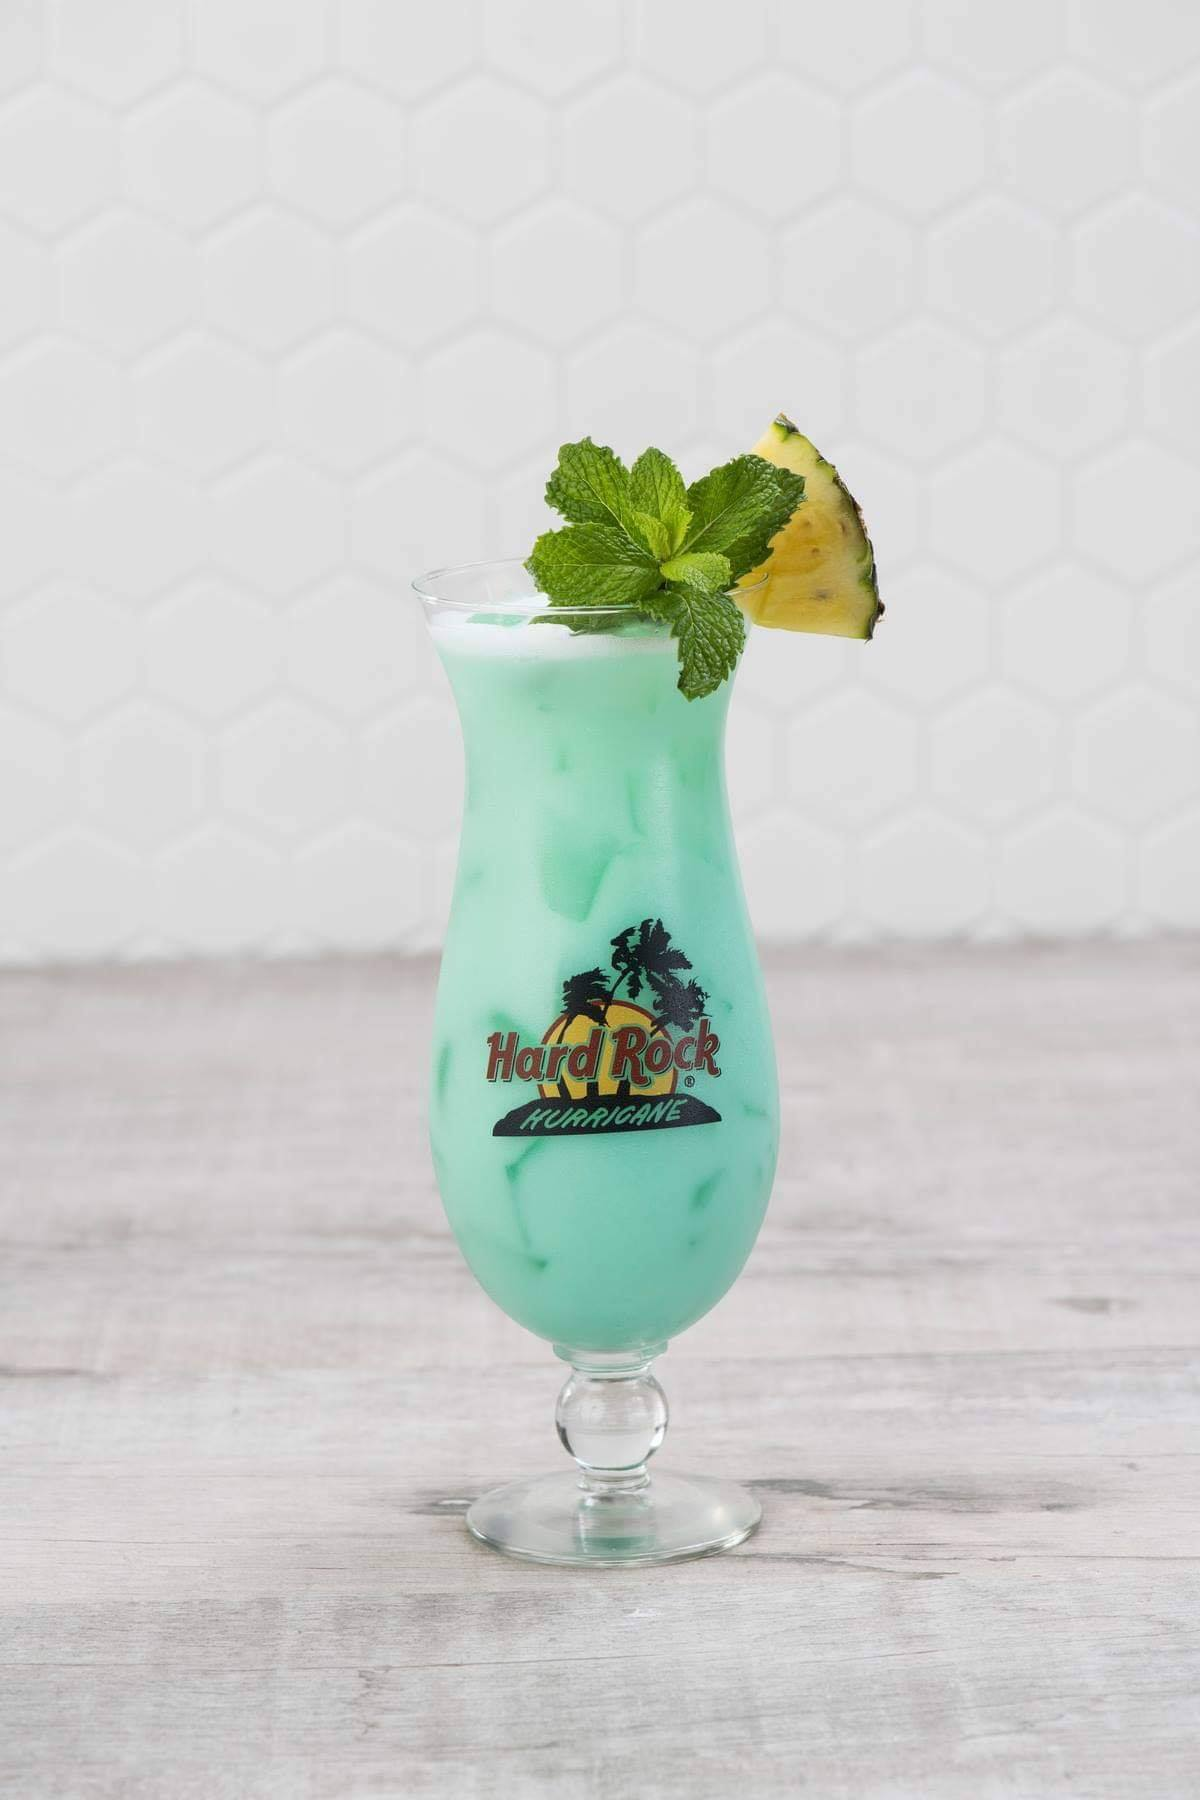 Hard Rock Cafe Hurricane Drink